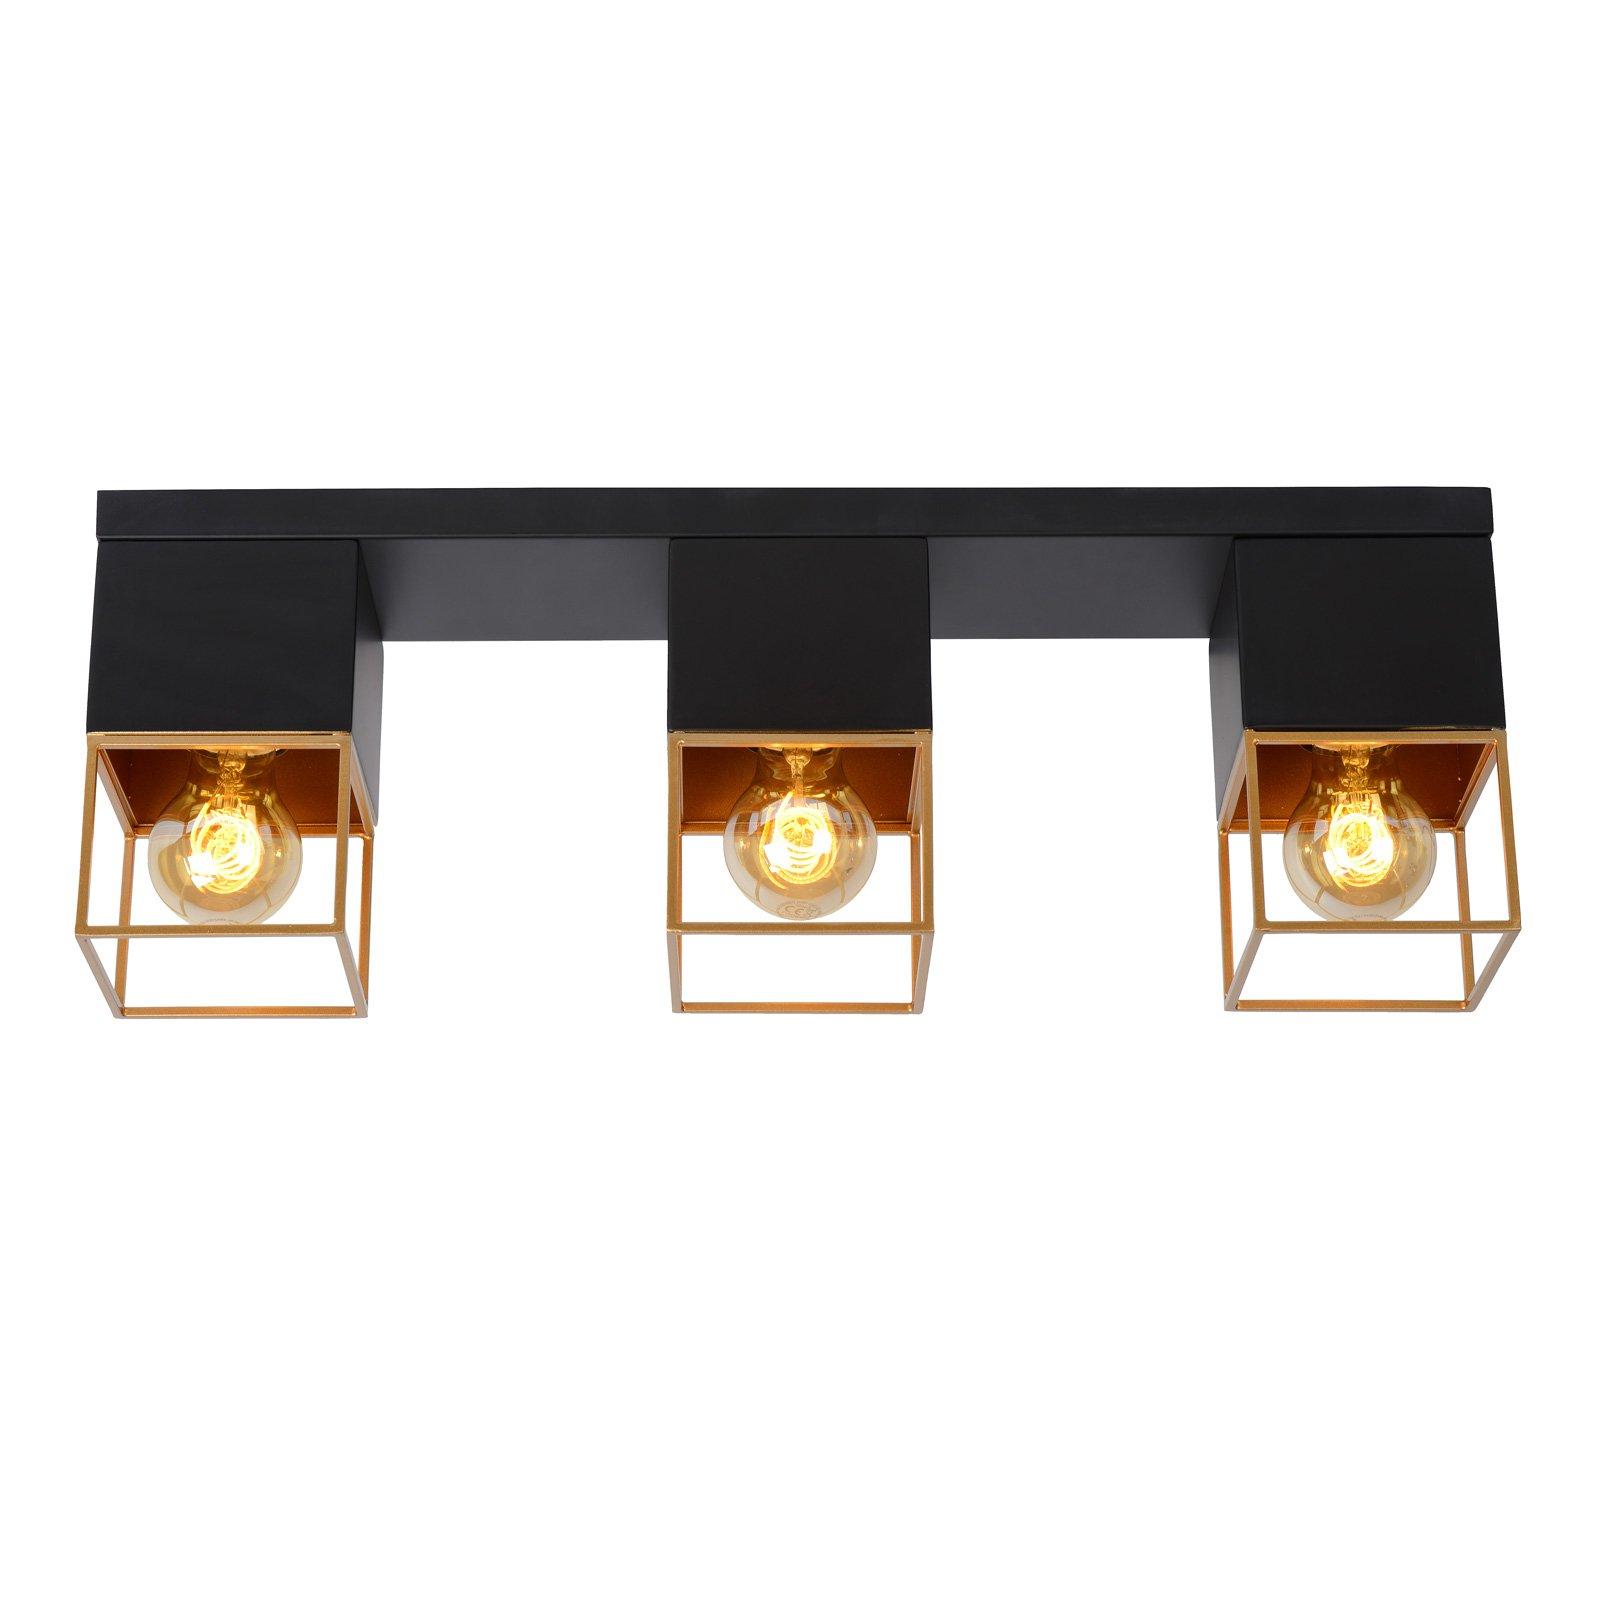 Rixt taklampe svart, kantet, 3 lyskilder